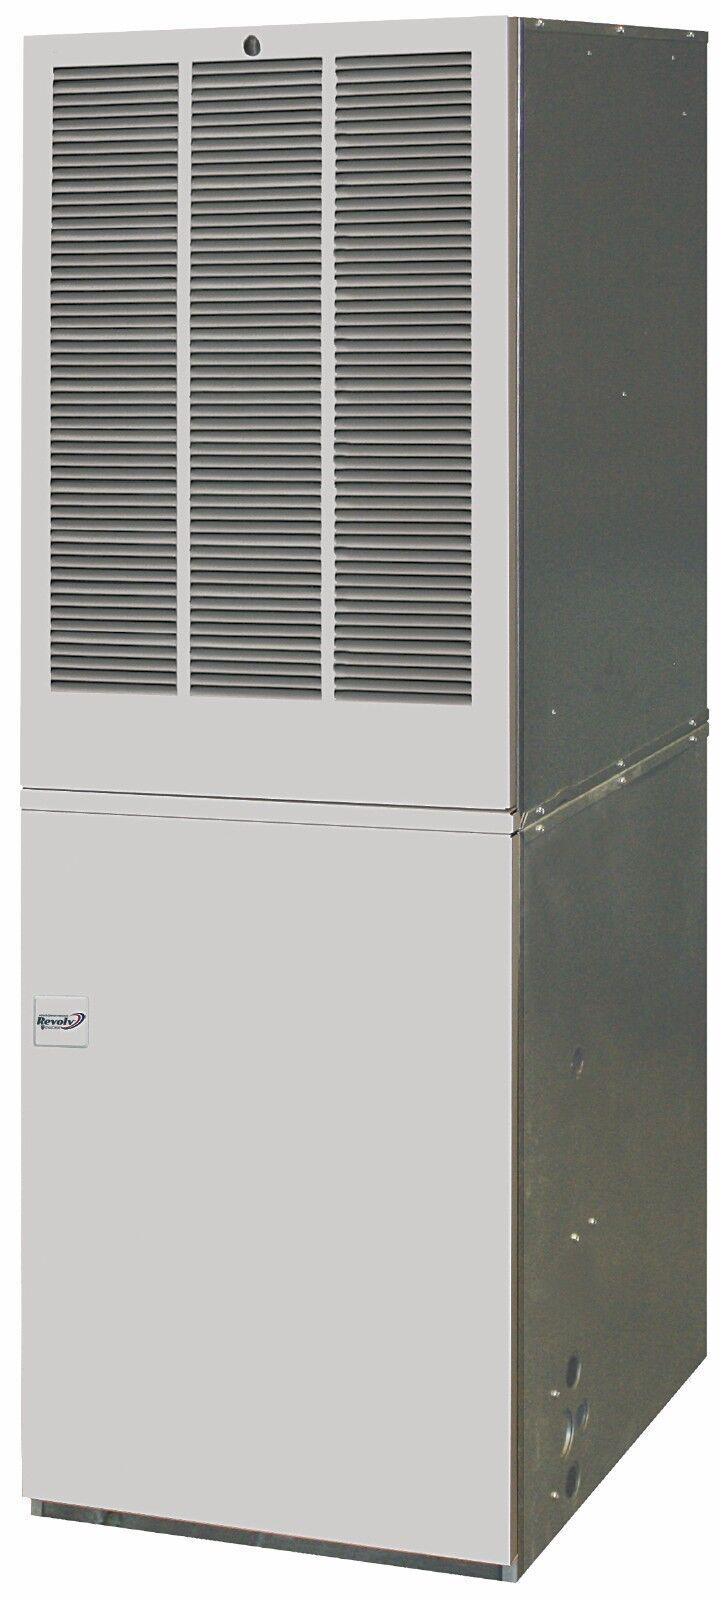 Revolv 70,000 BTU 20KW Electric Mobile Home Furnace | Wundr-Shop